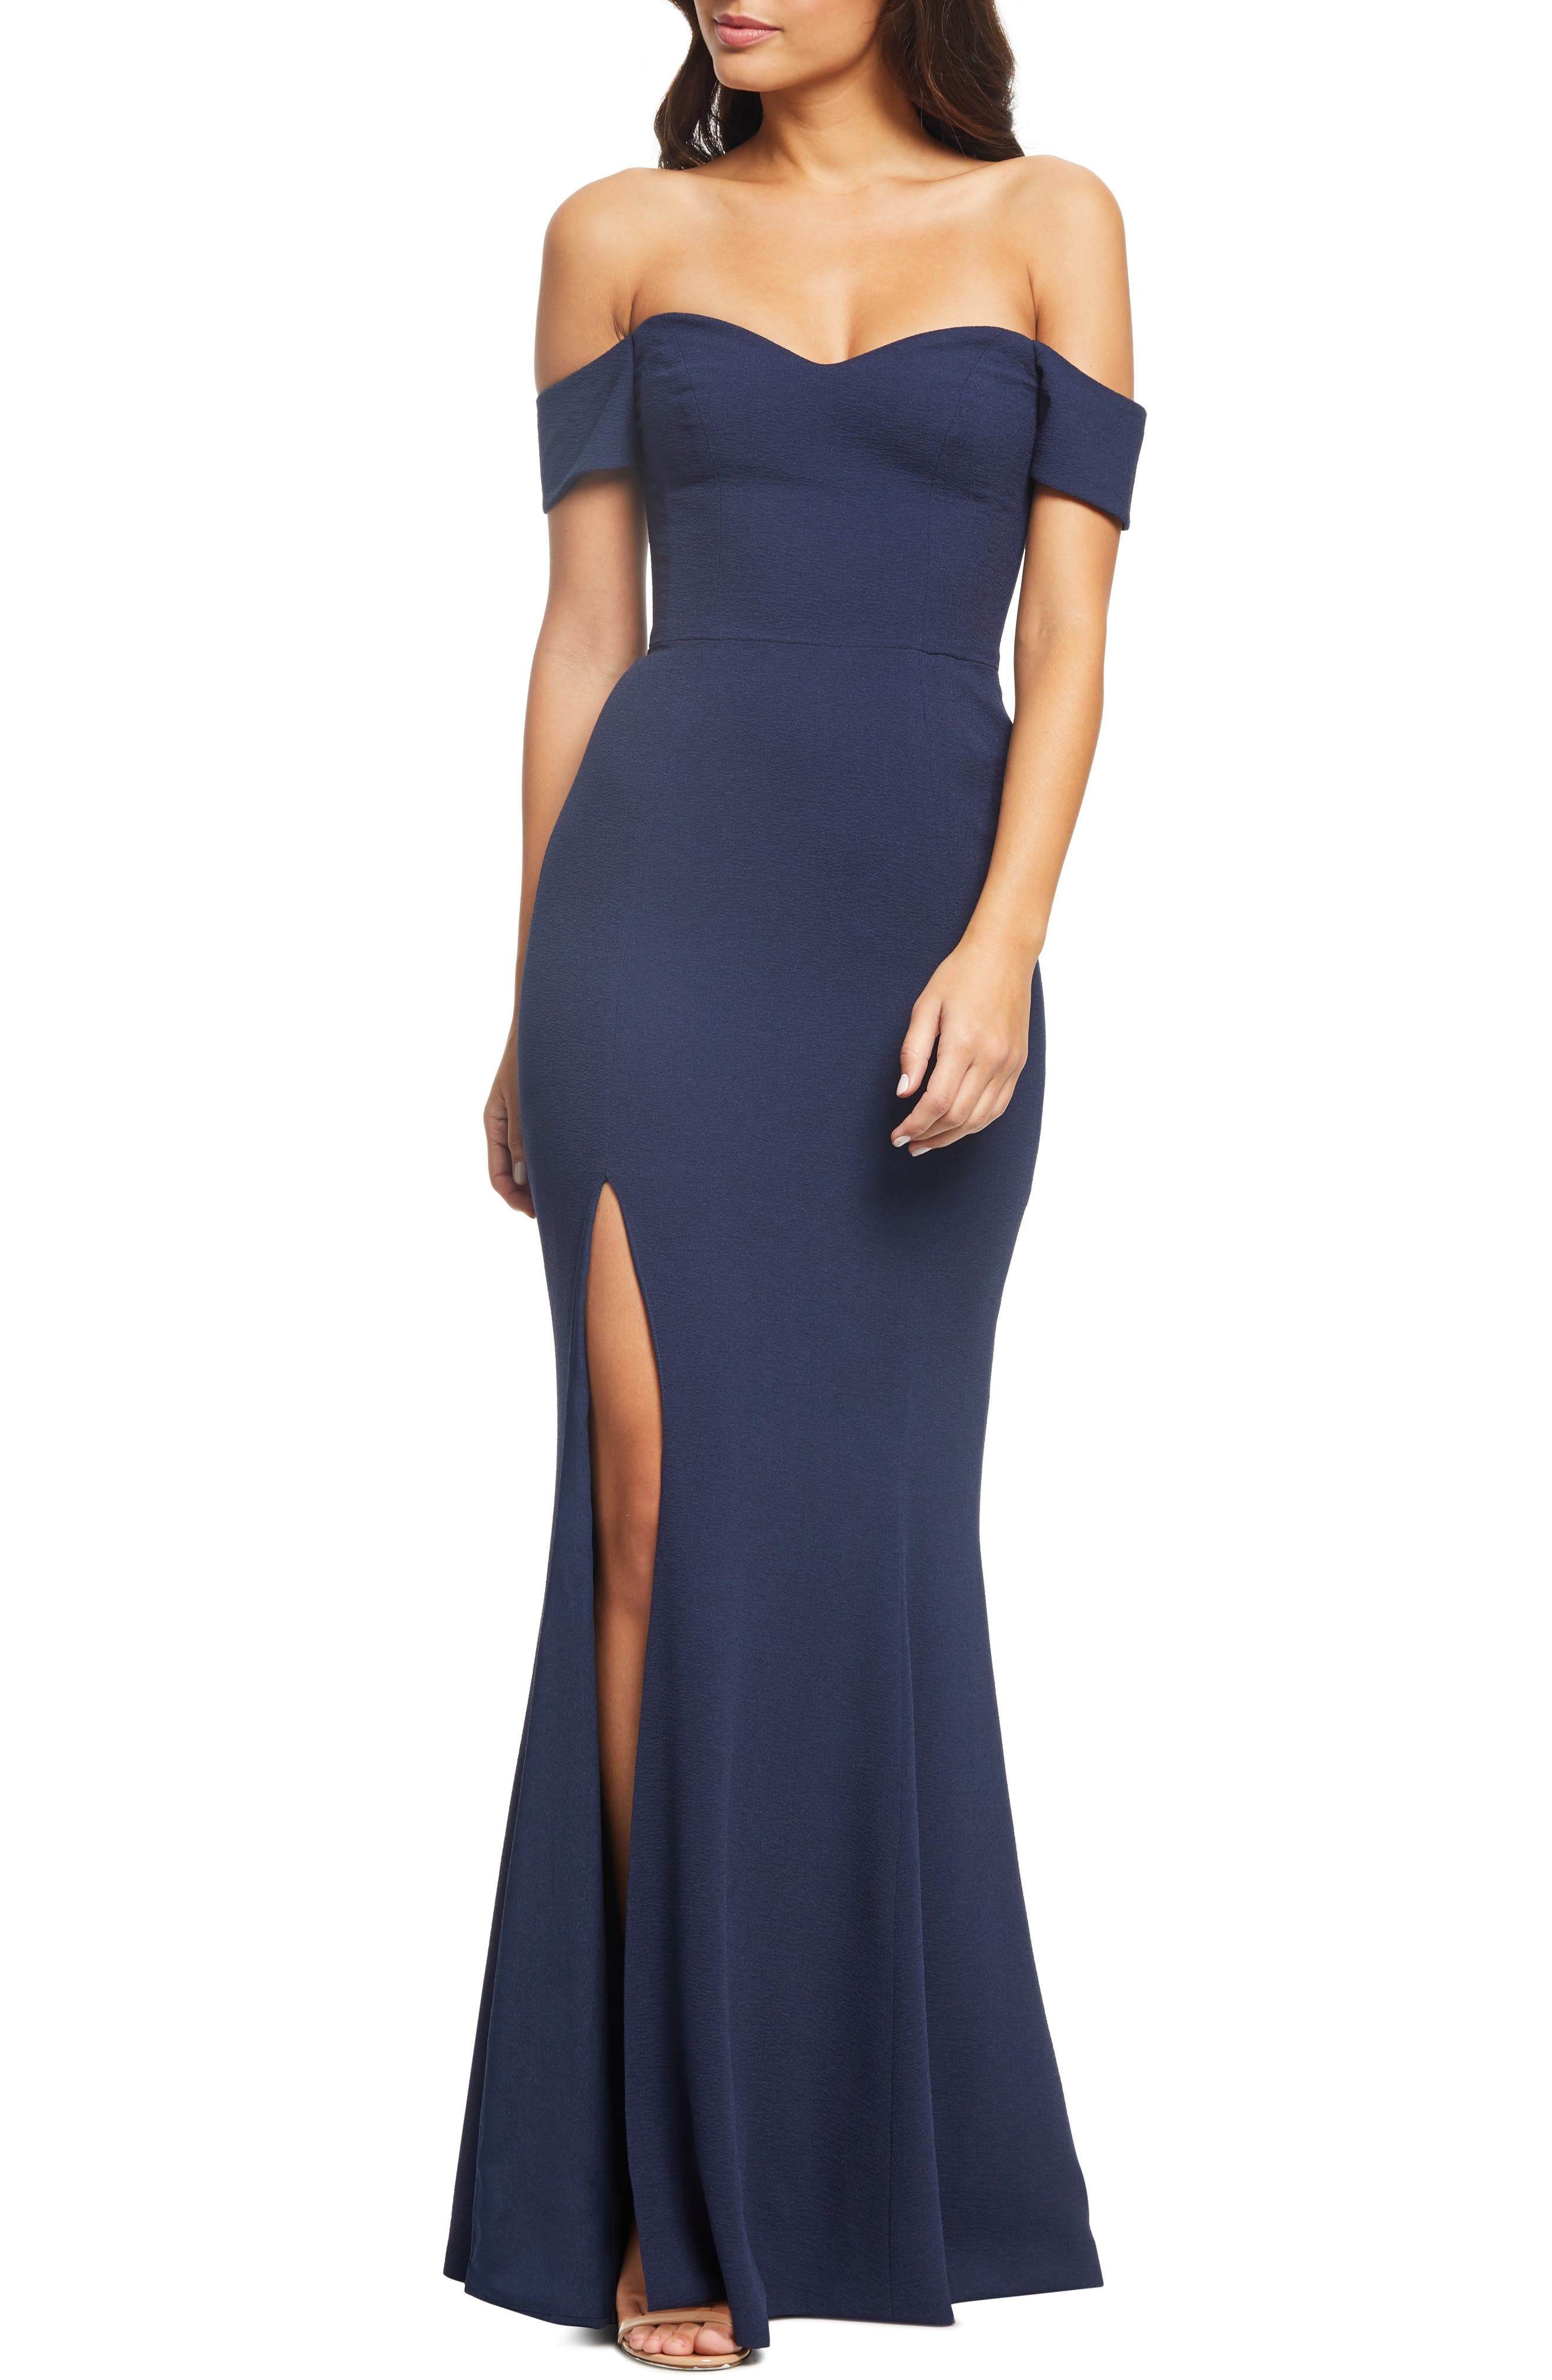 Dress The Population Logan Off The Shoulder Evening Dress, Blue